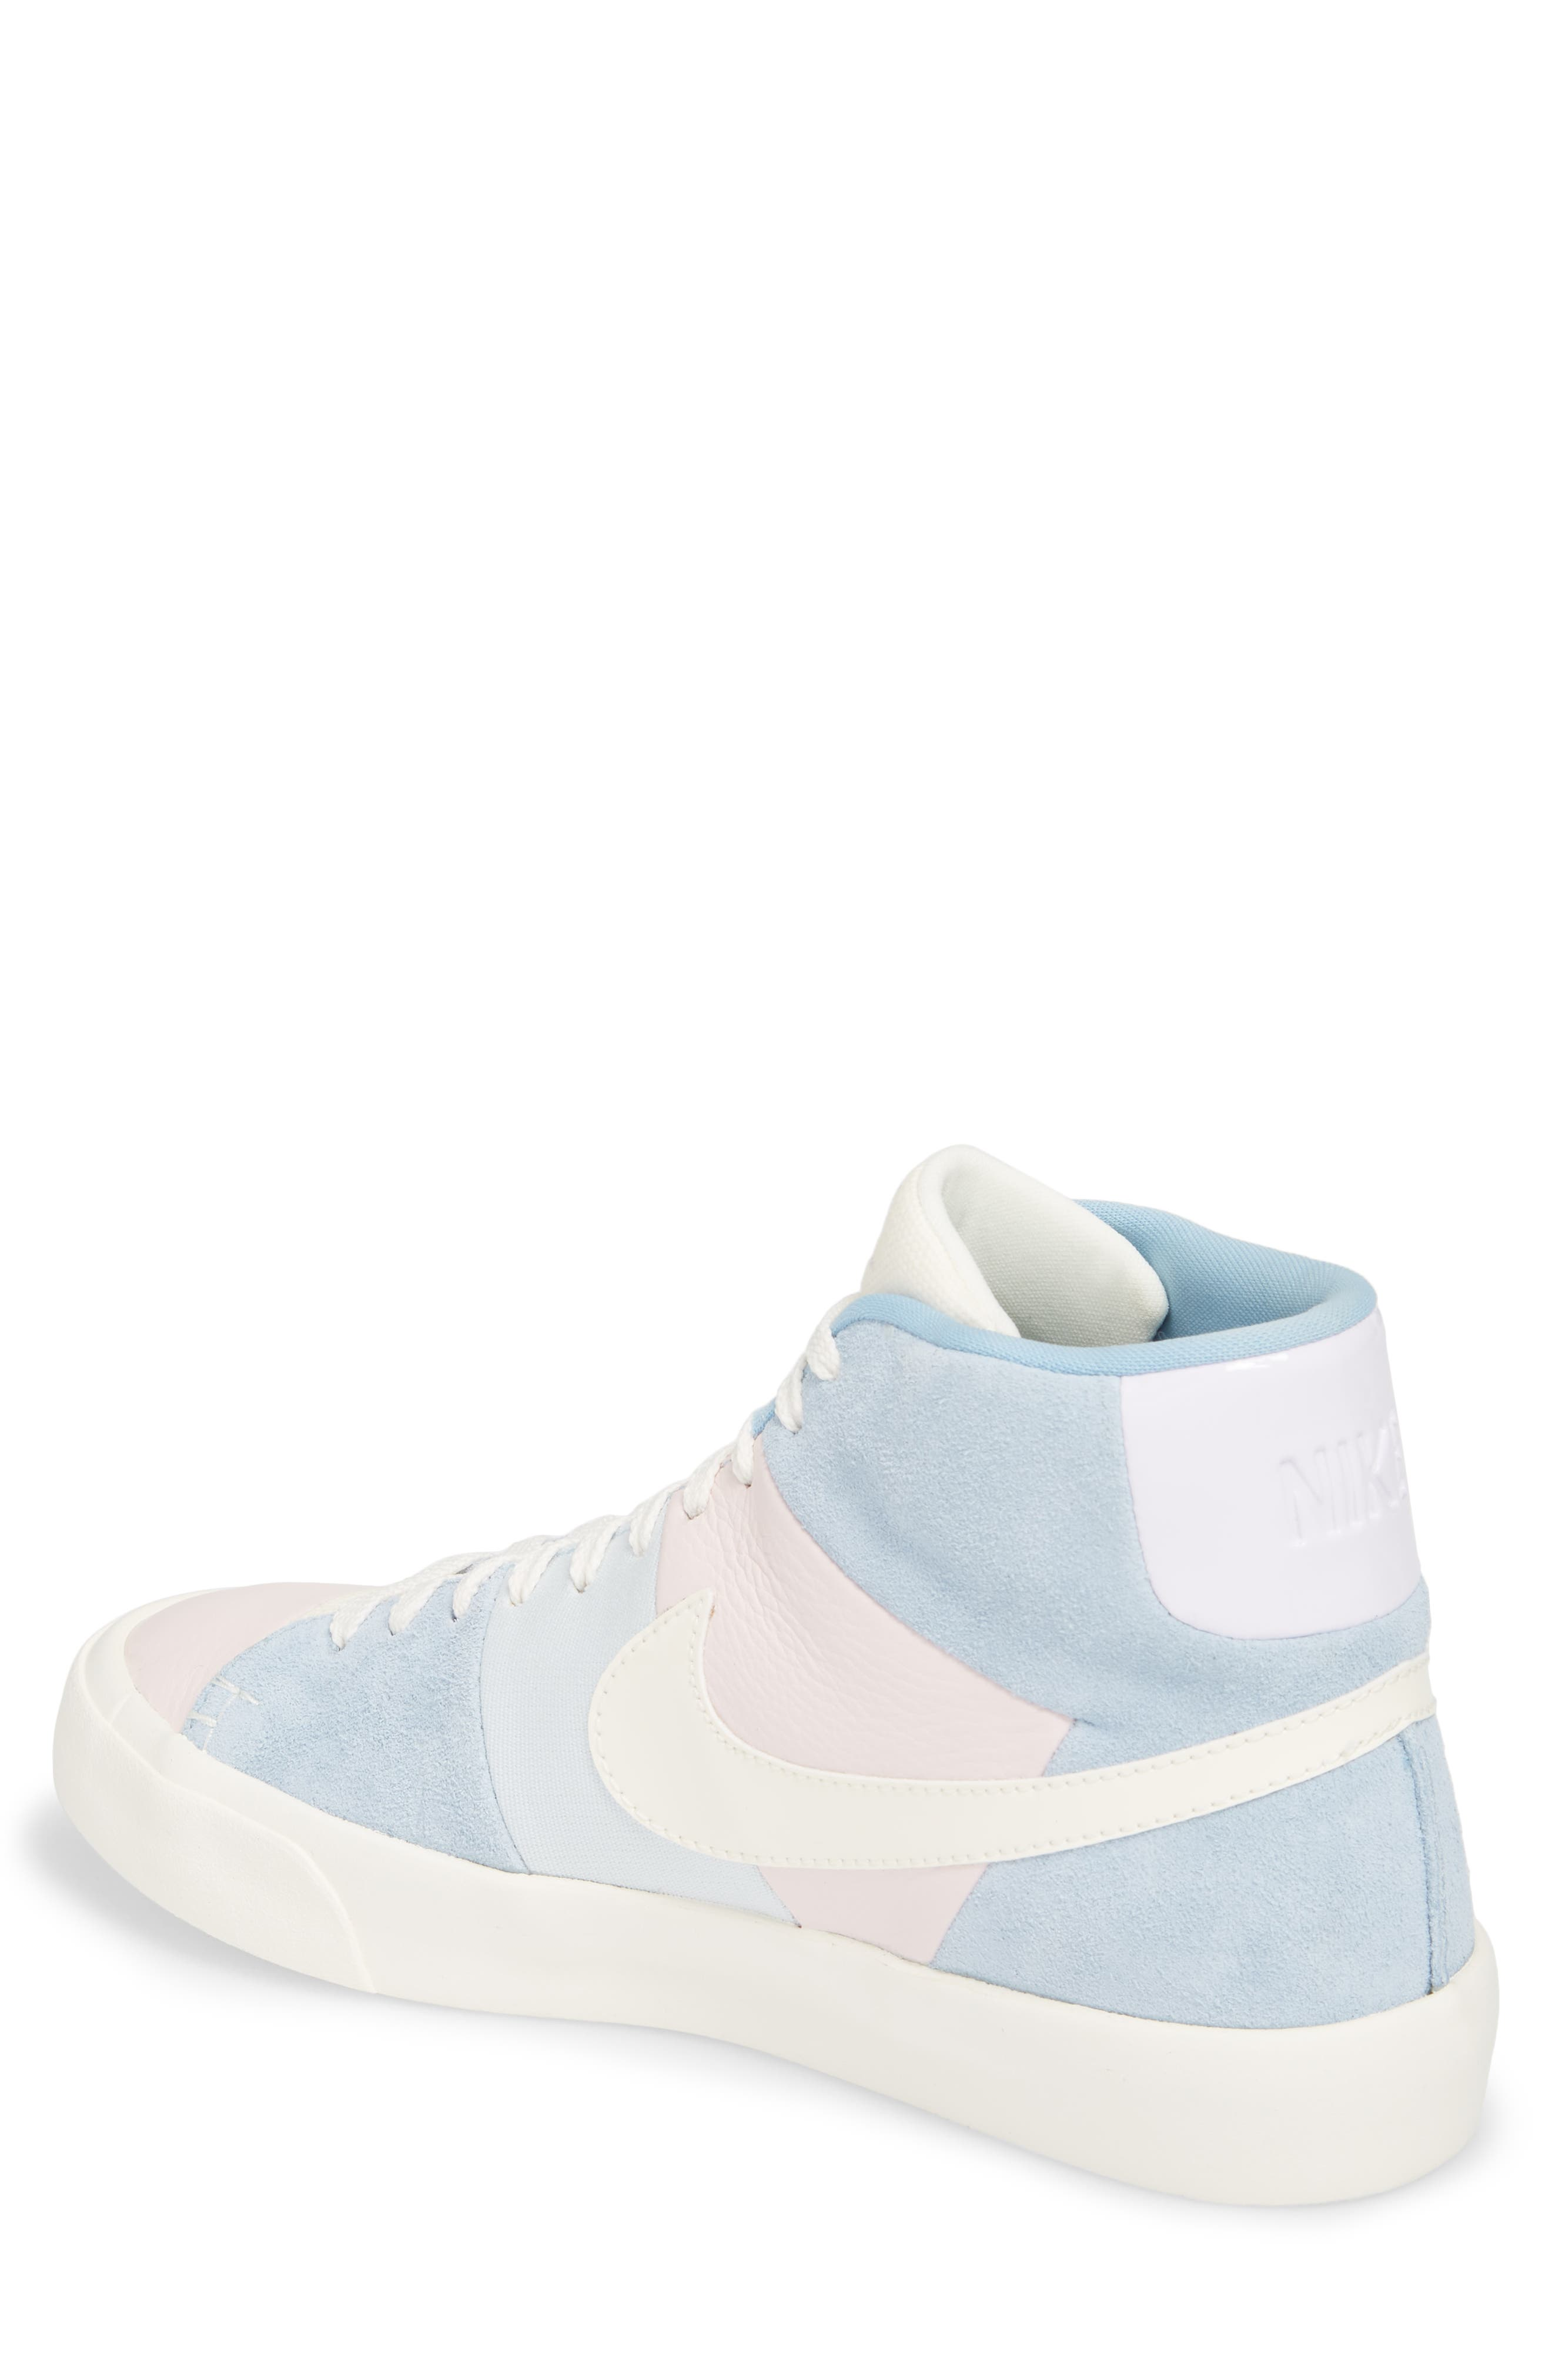 Blazer Royal Easter QS High Top Sneaker,                             Alternate thumbnail 2, color,                             Arctic Pink/ Sail-Blue-Blue